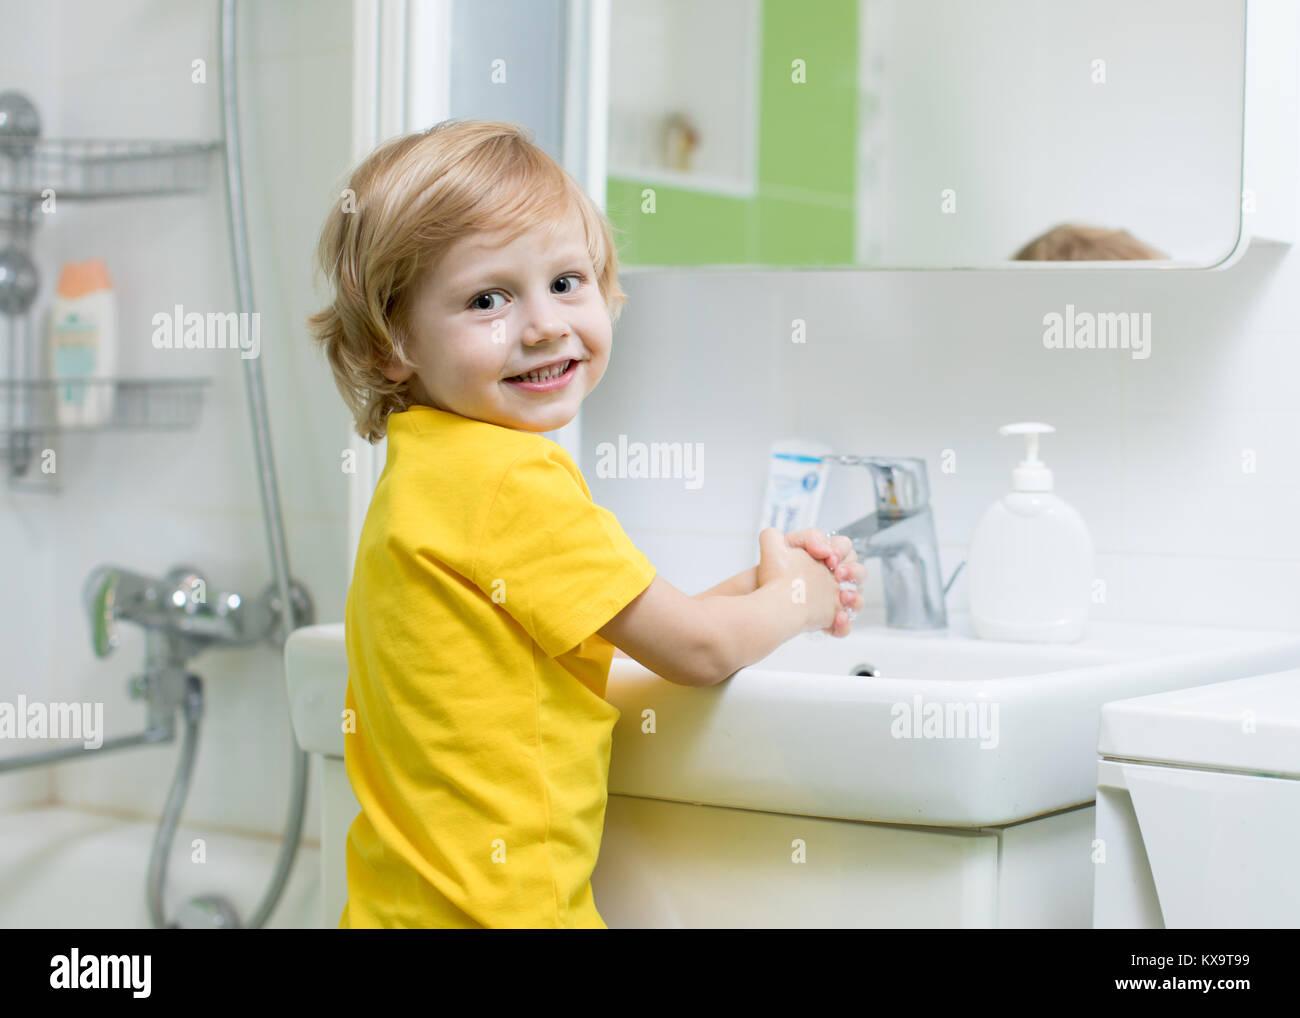 Little child boy washing hands in bathroom - Stock Image